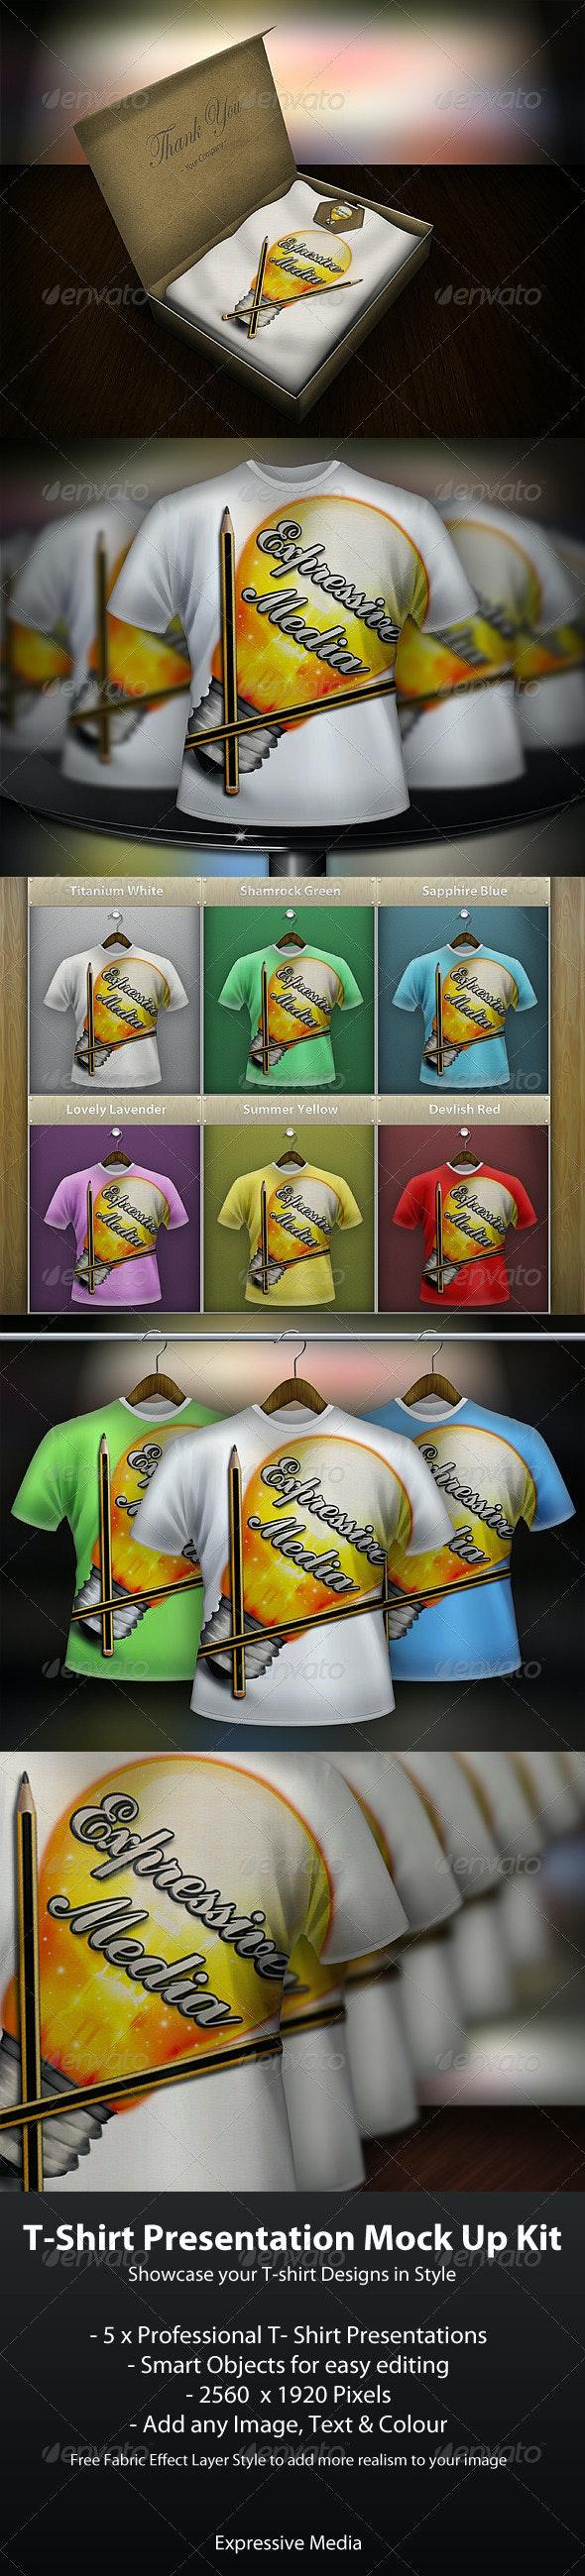 T-Shirt Presentation Mock up Kit - T-shirts Apparel